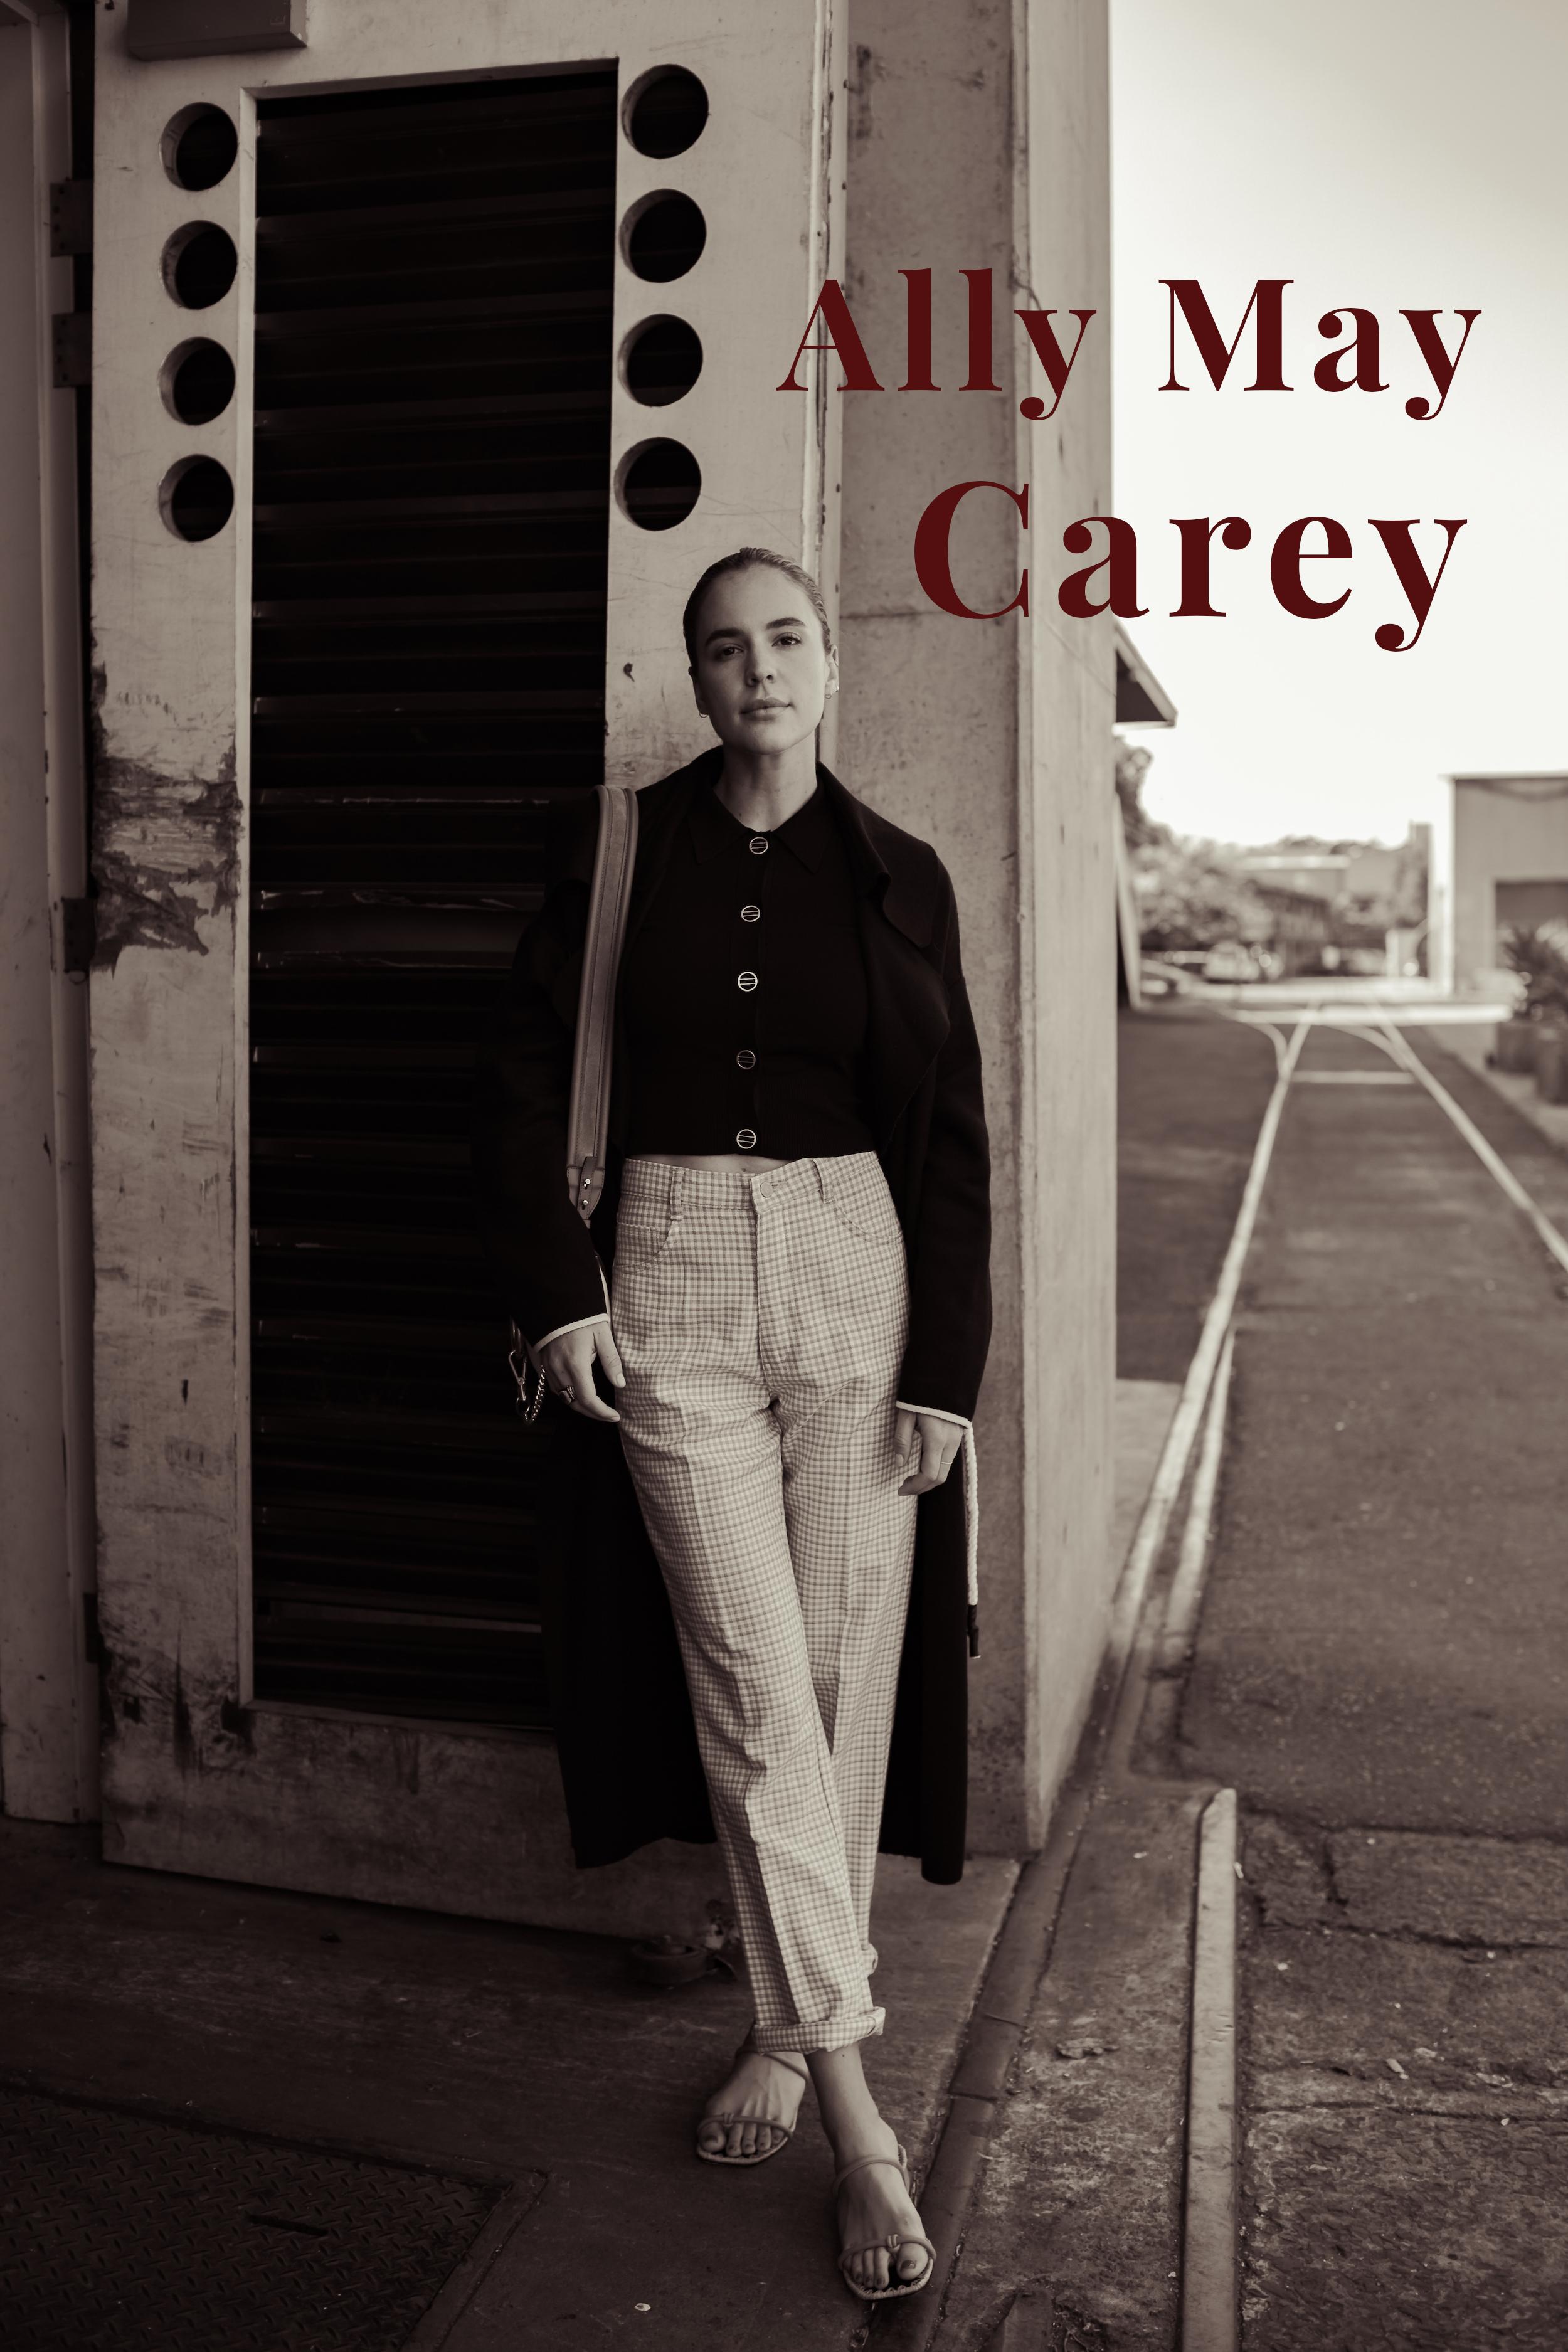 Ally May Carey